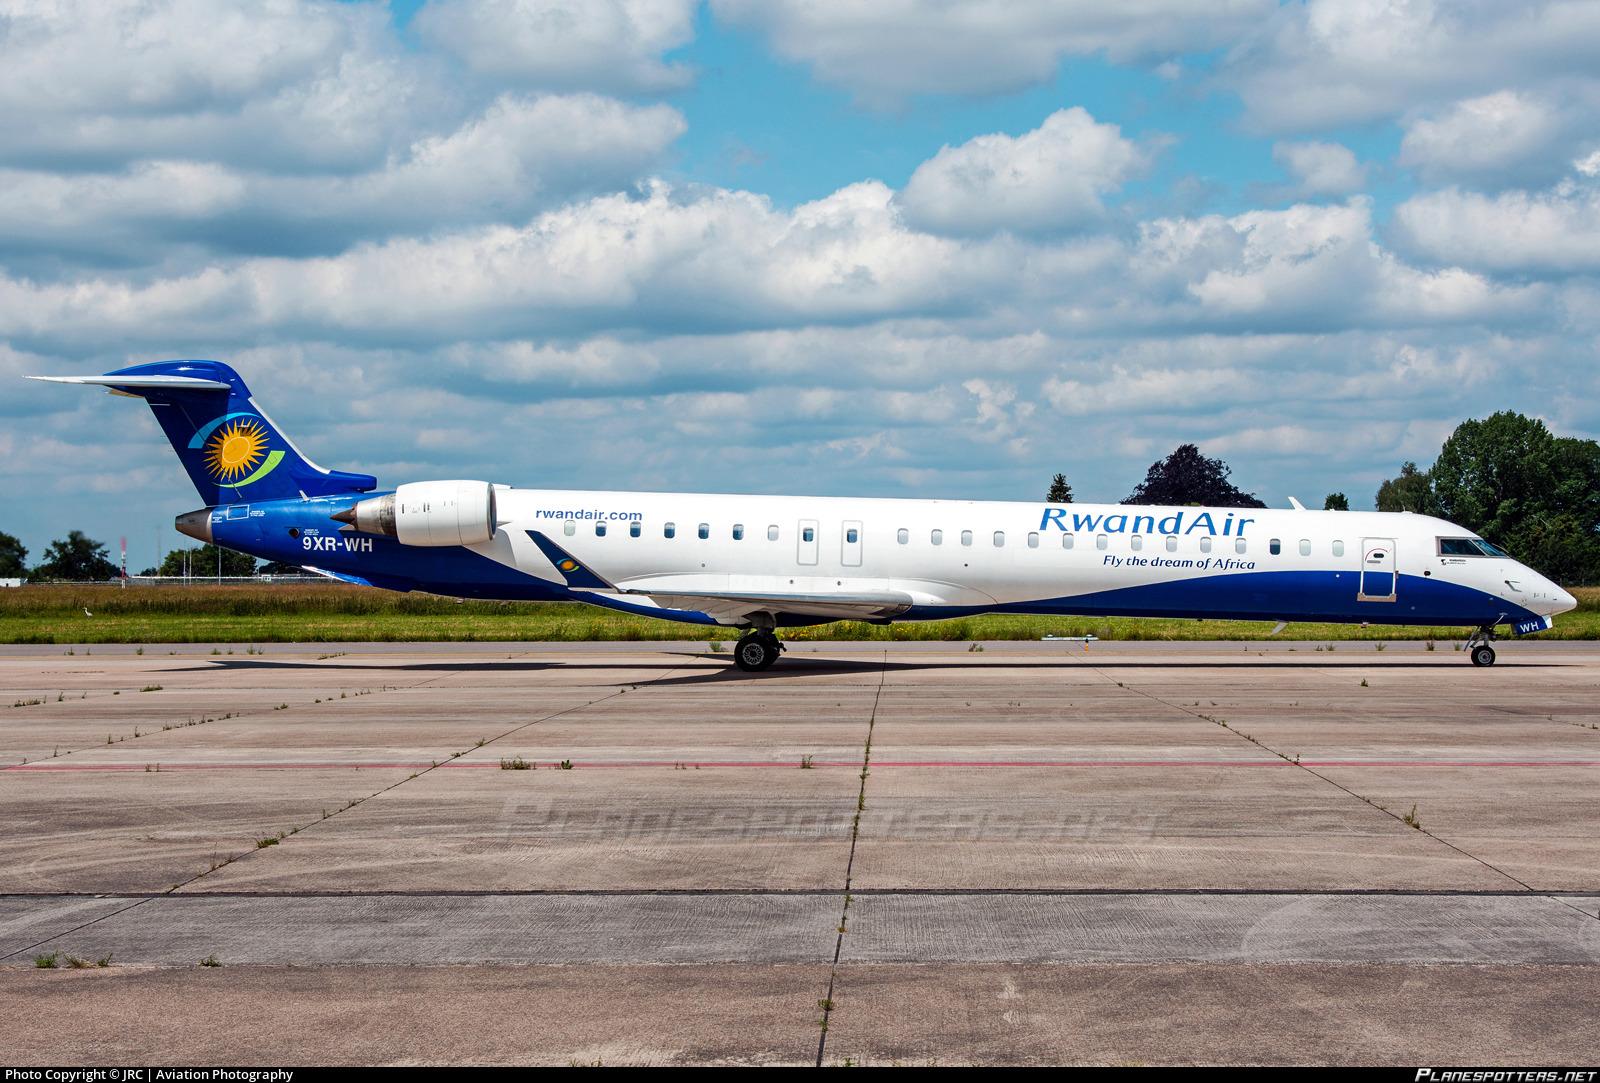 9XR-WH RwandAir Bombardier CRJ-900 (CL-600-2D24) Photo by